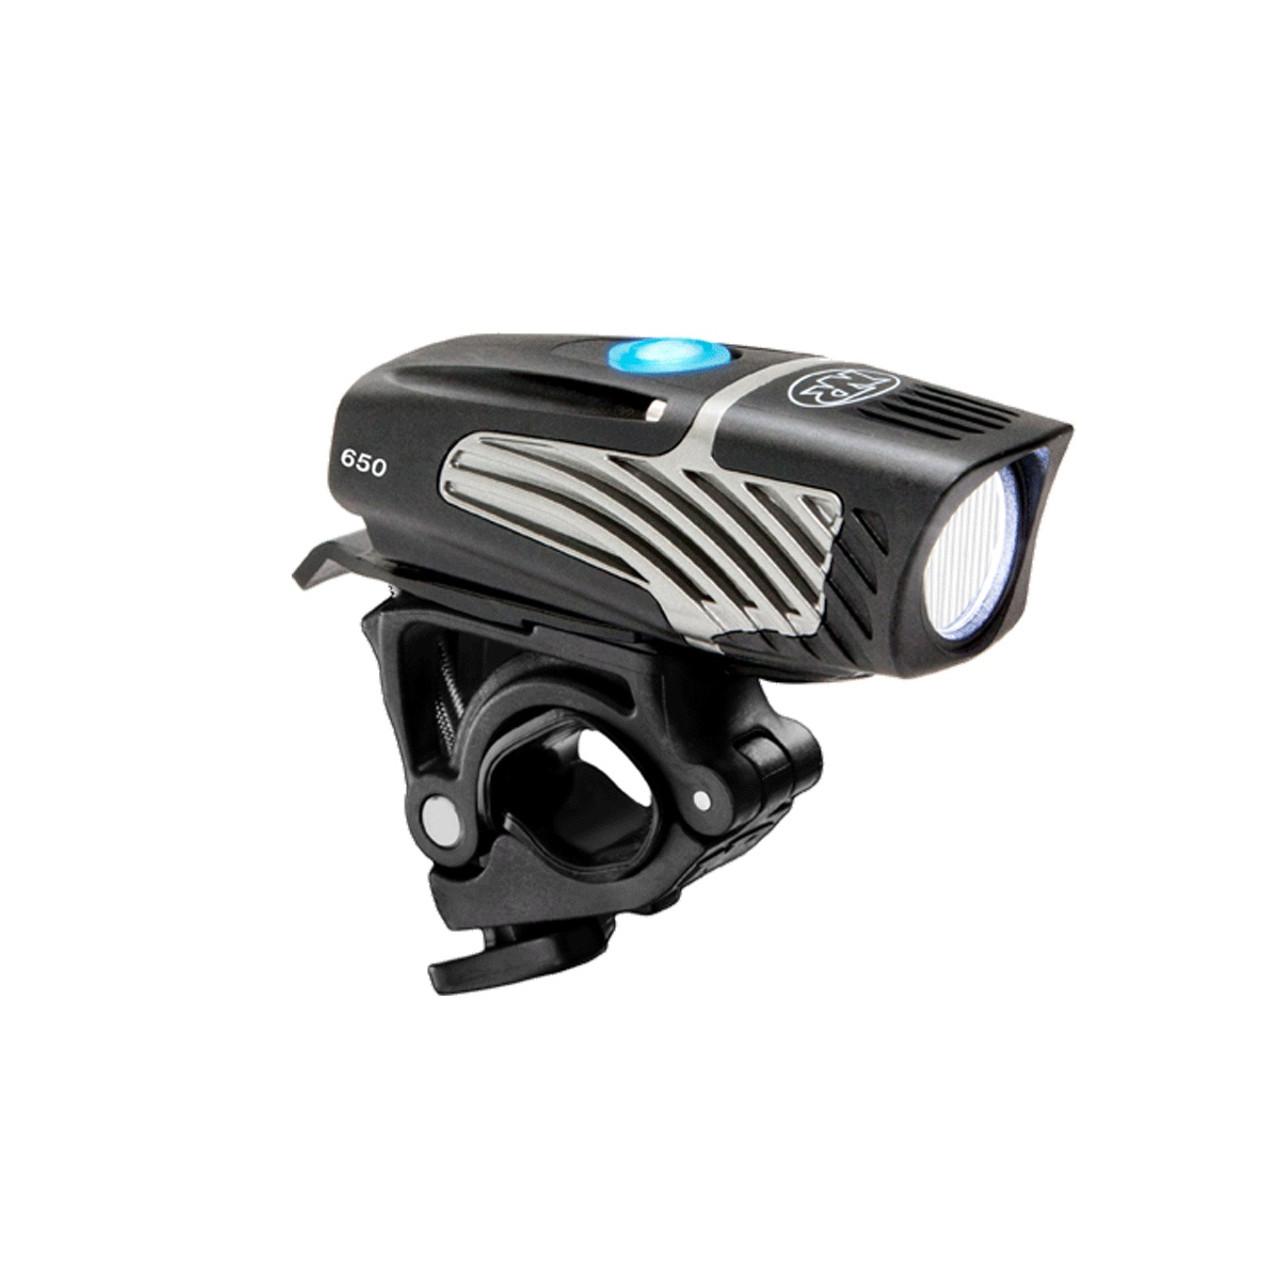 Niterider Lumina Micro 650 LED Front Light In Black